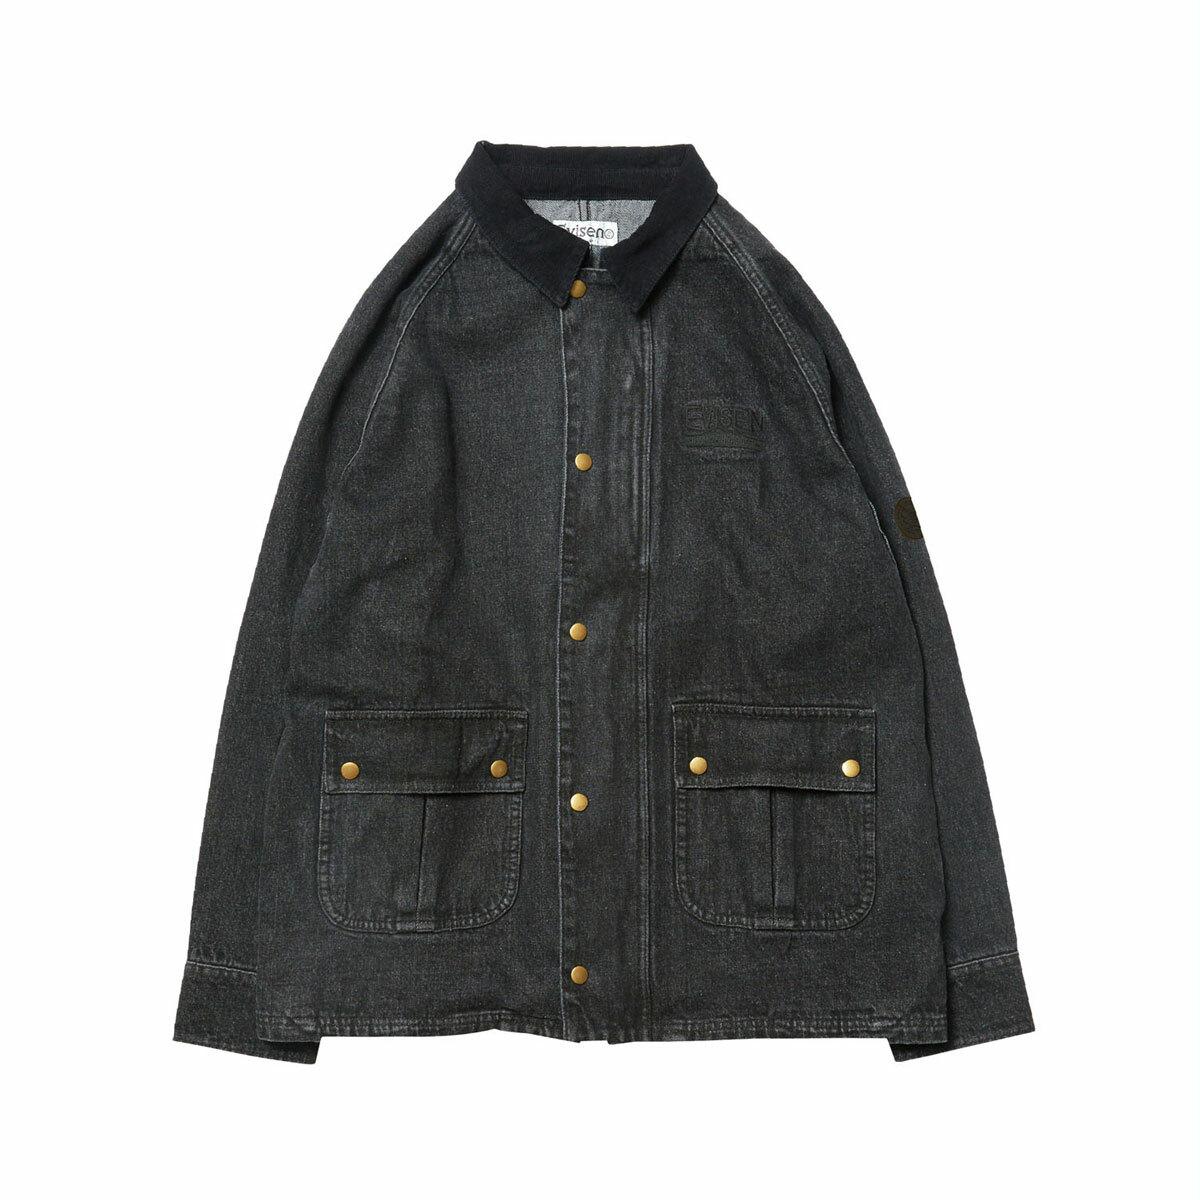 EVISEN 【CONTRA JKT BLACK DENIM】